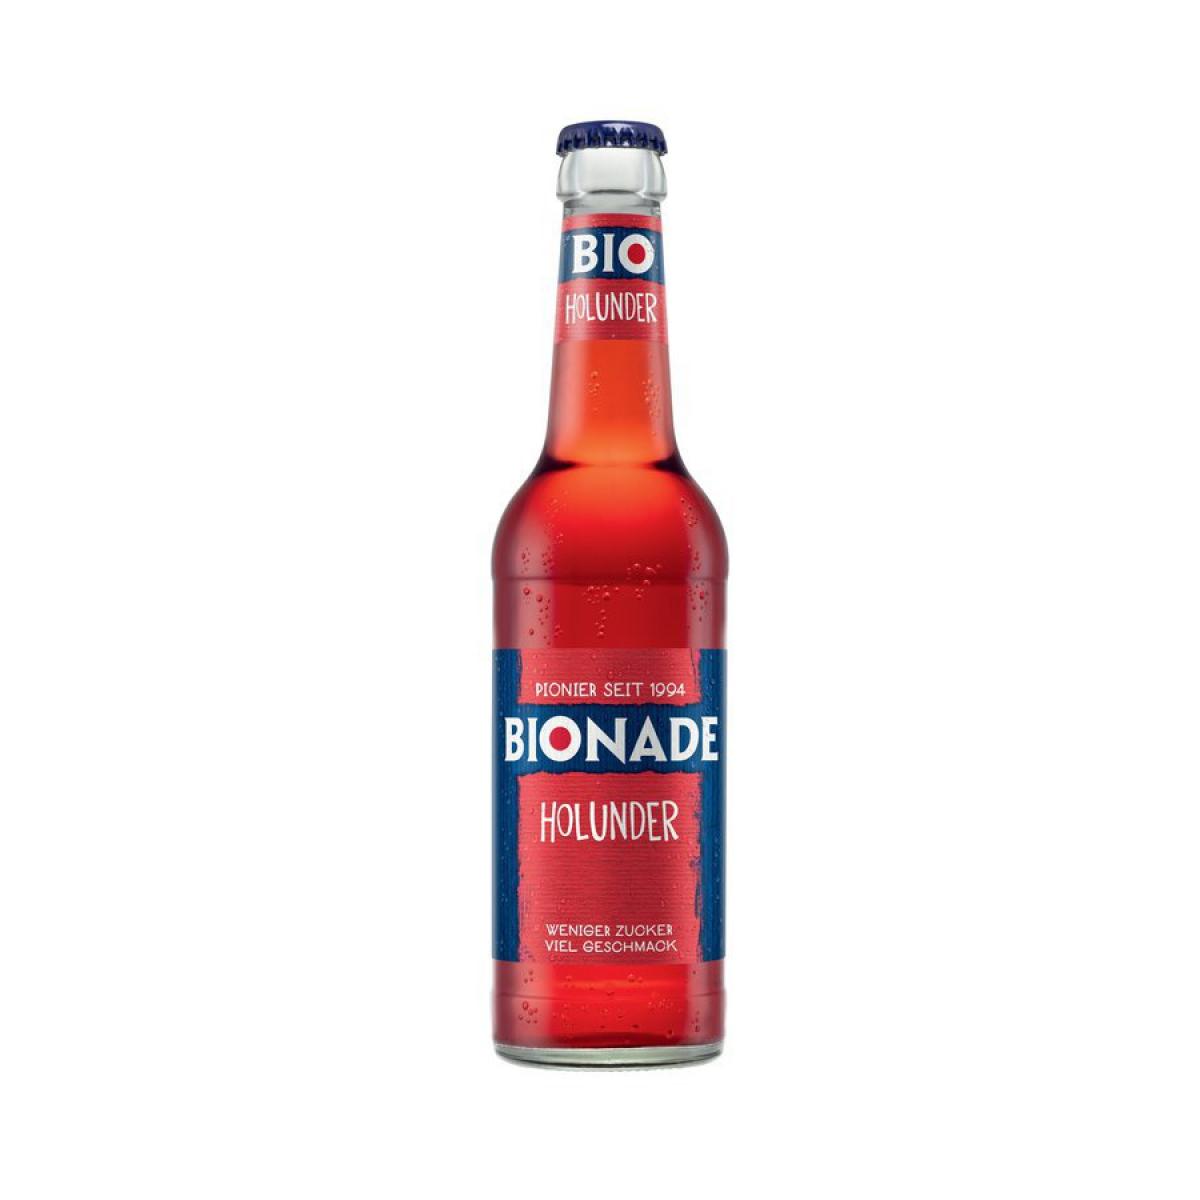 Bionade HOLUNDER. 24x0,33L